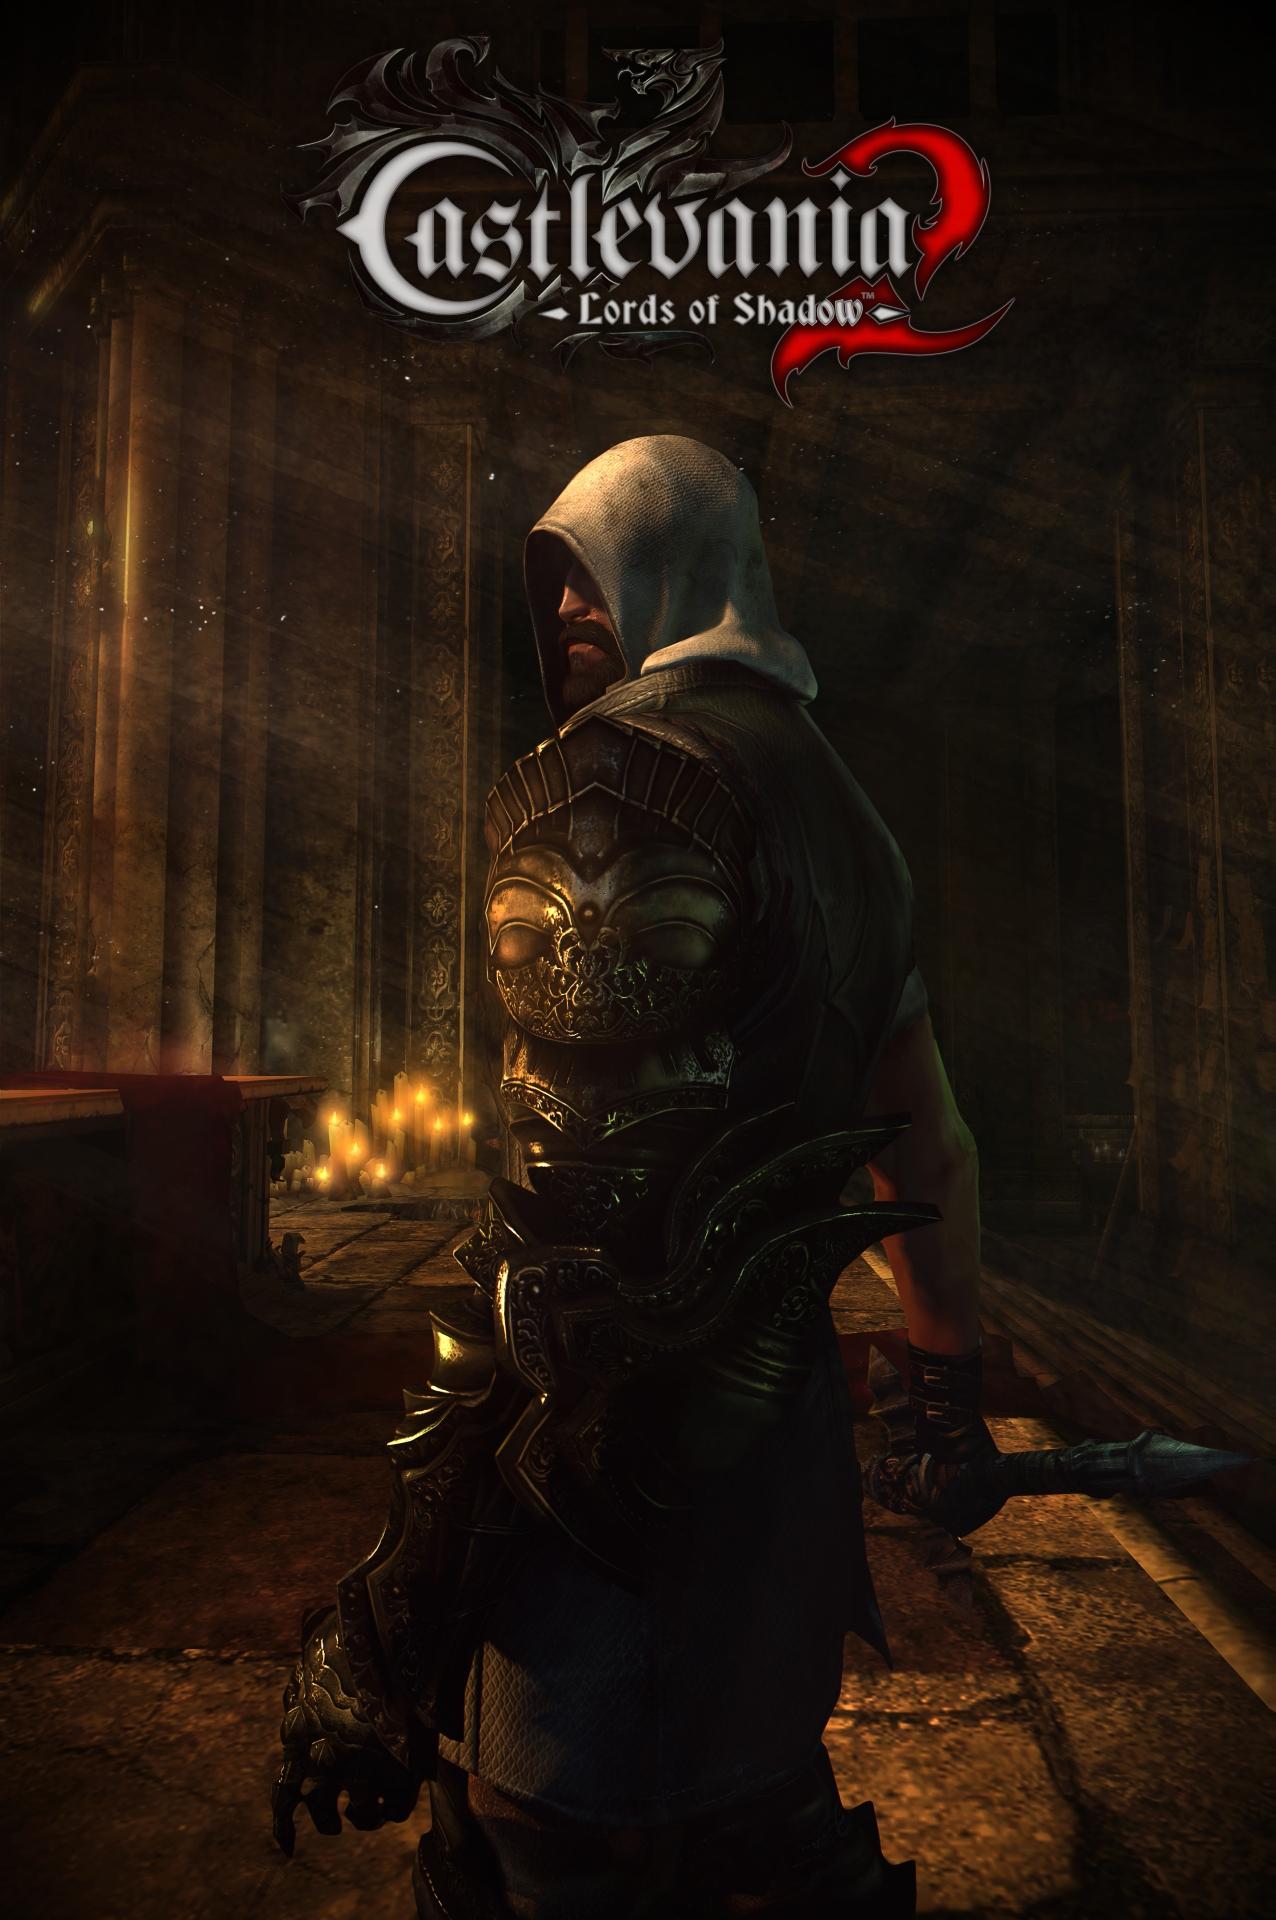 Tajemně krásné artworky z Castlevania: Lords of Shadow 2 86789